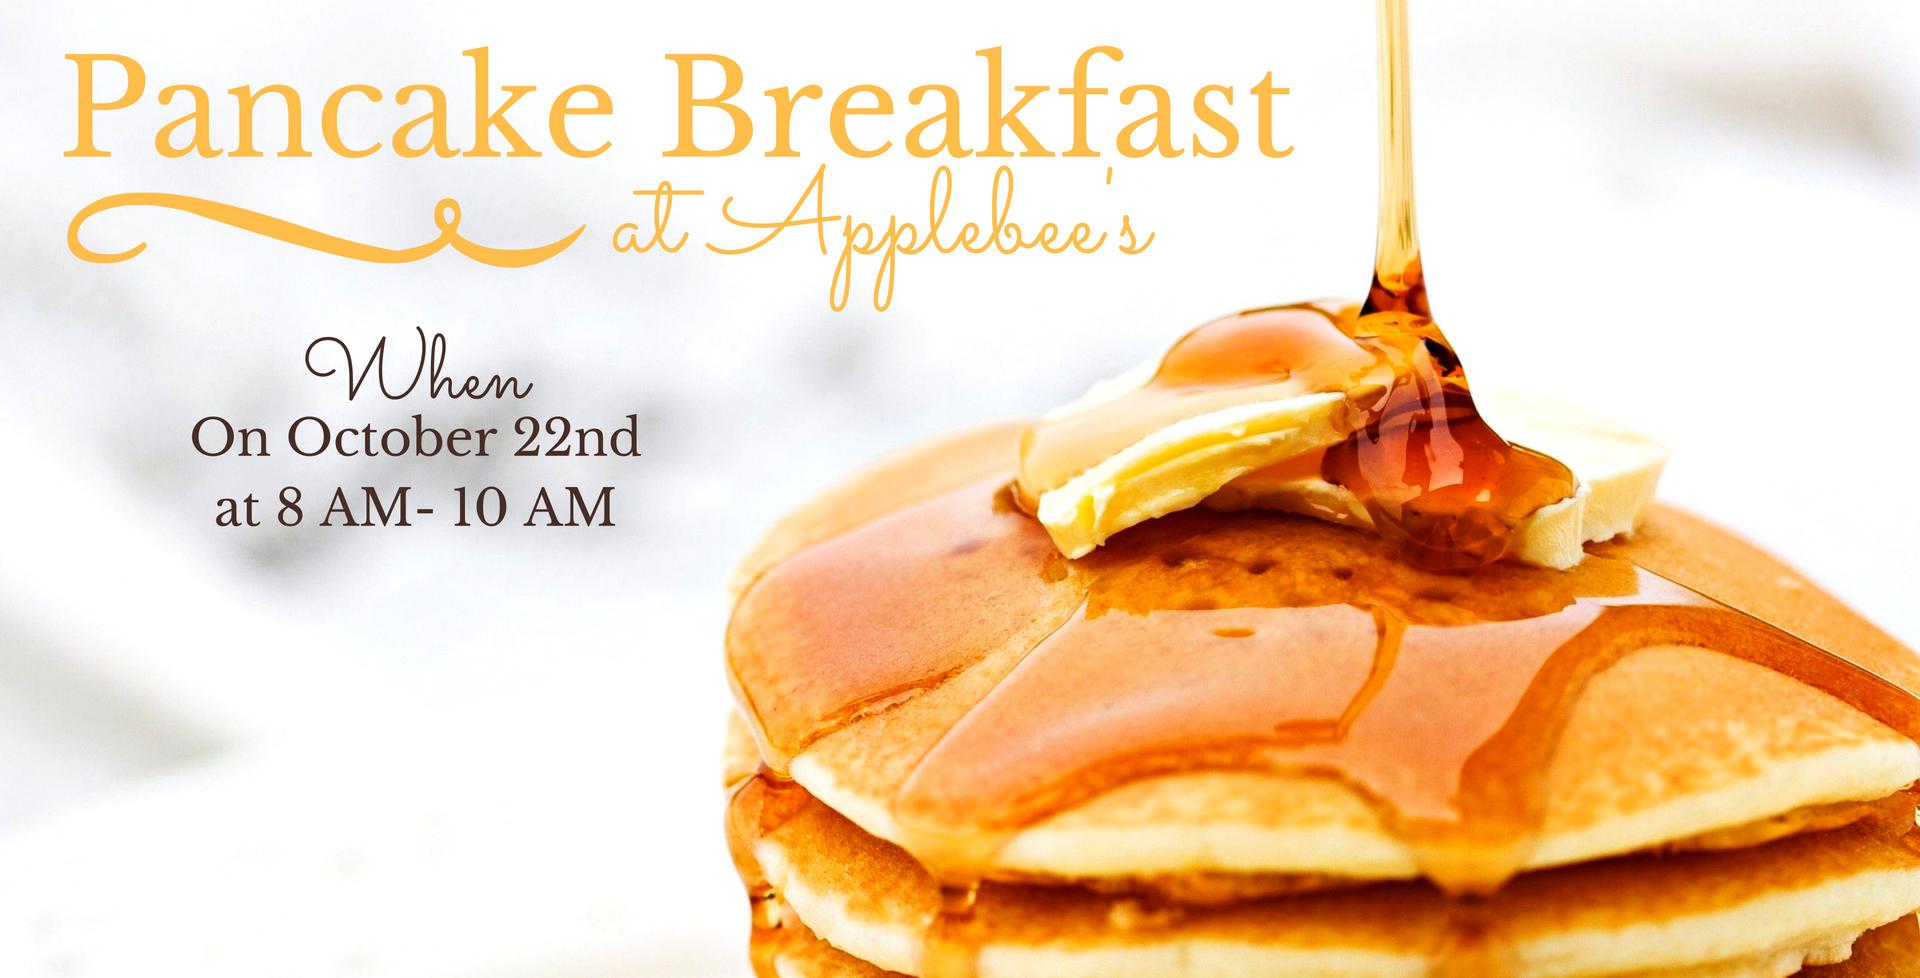 October 22 > Pancake Breakfast